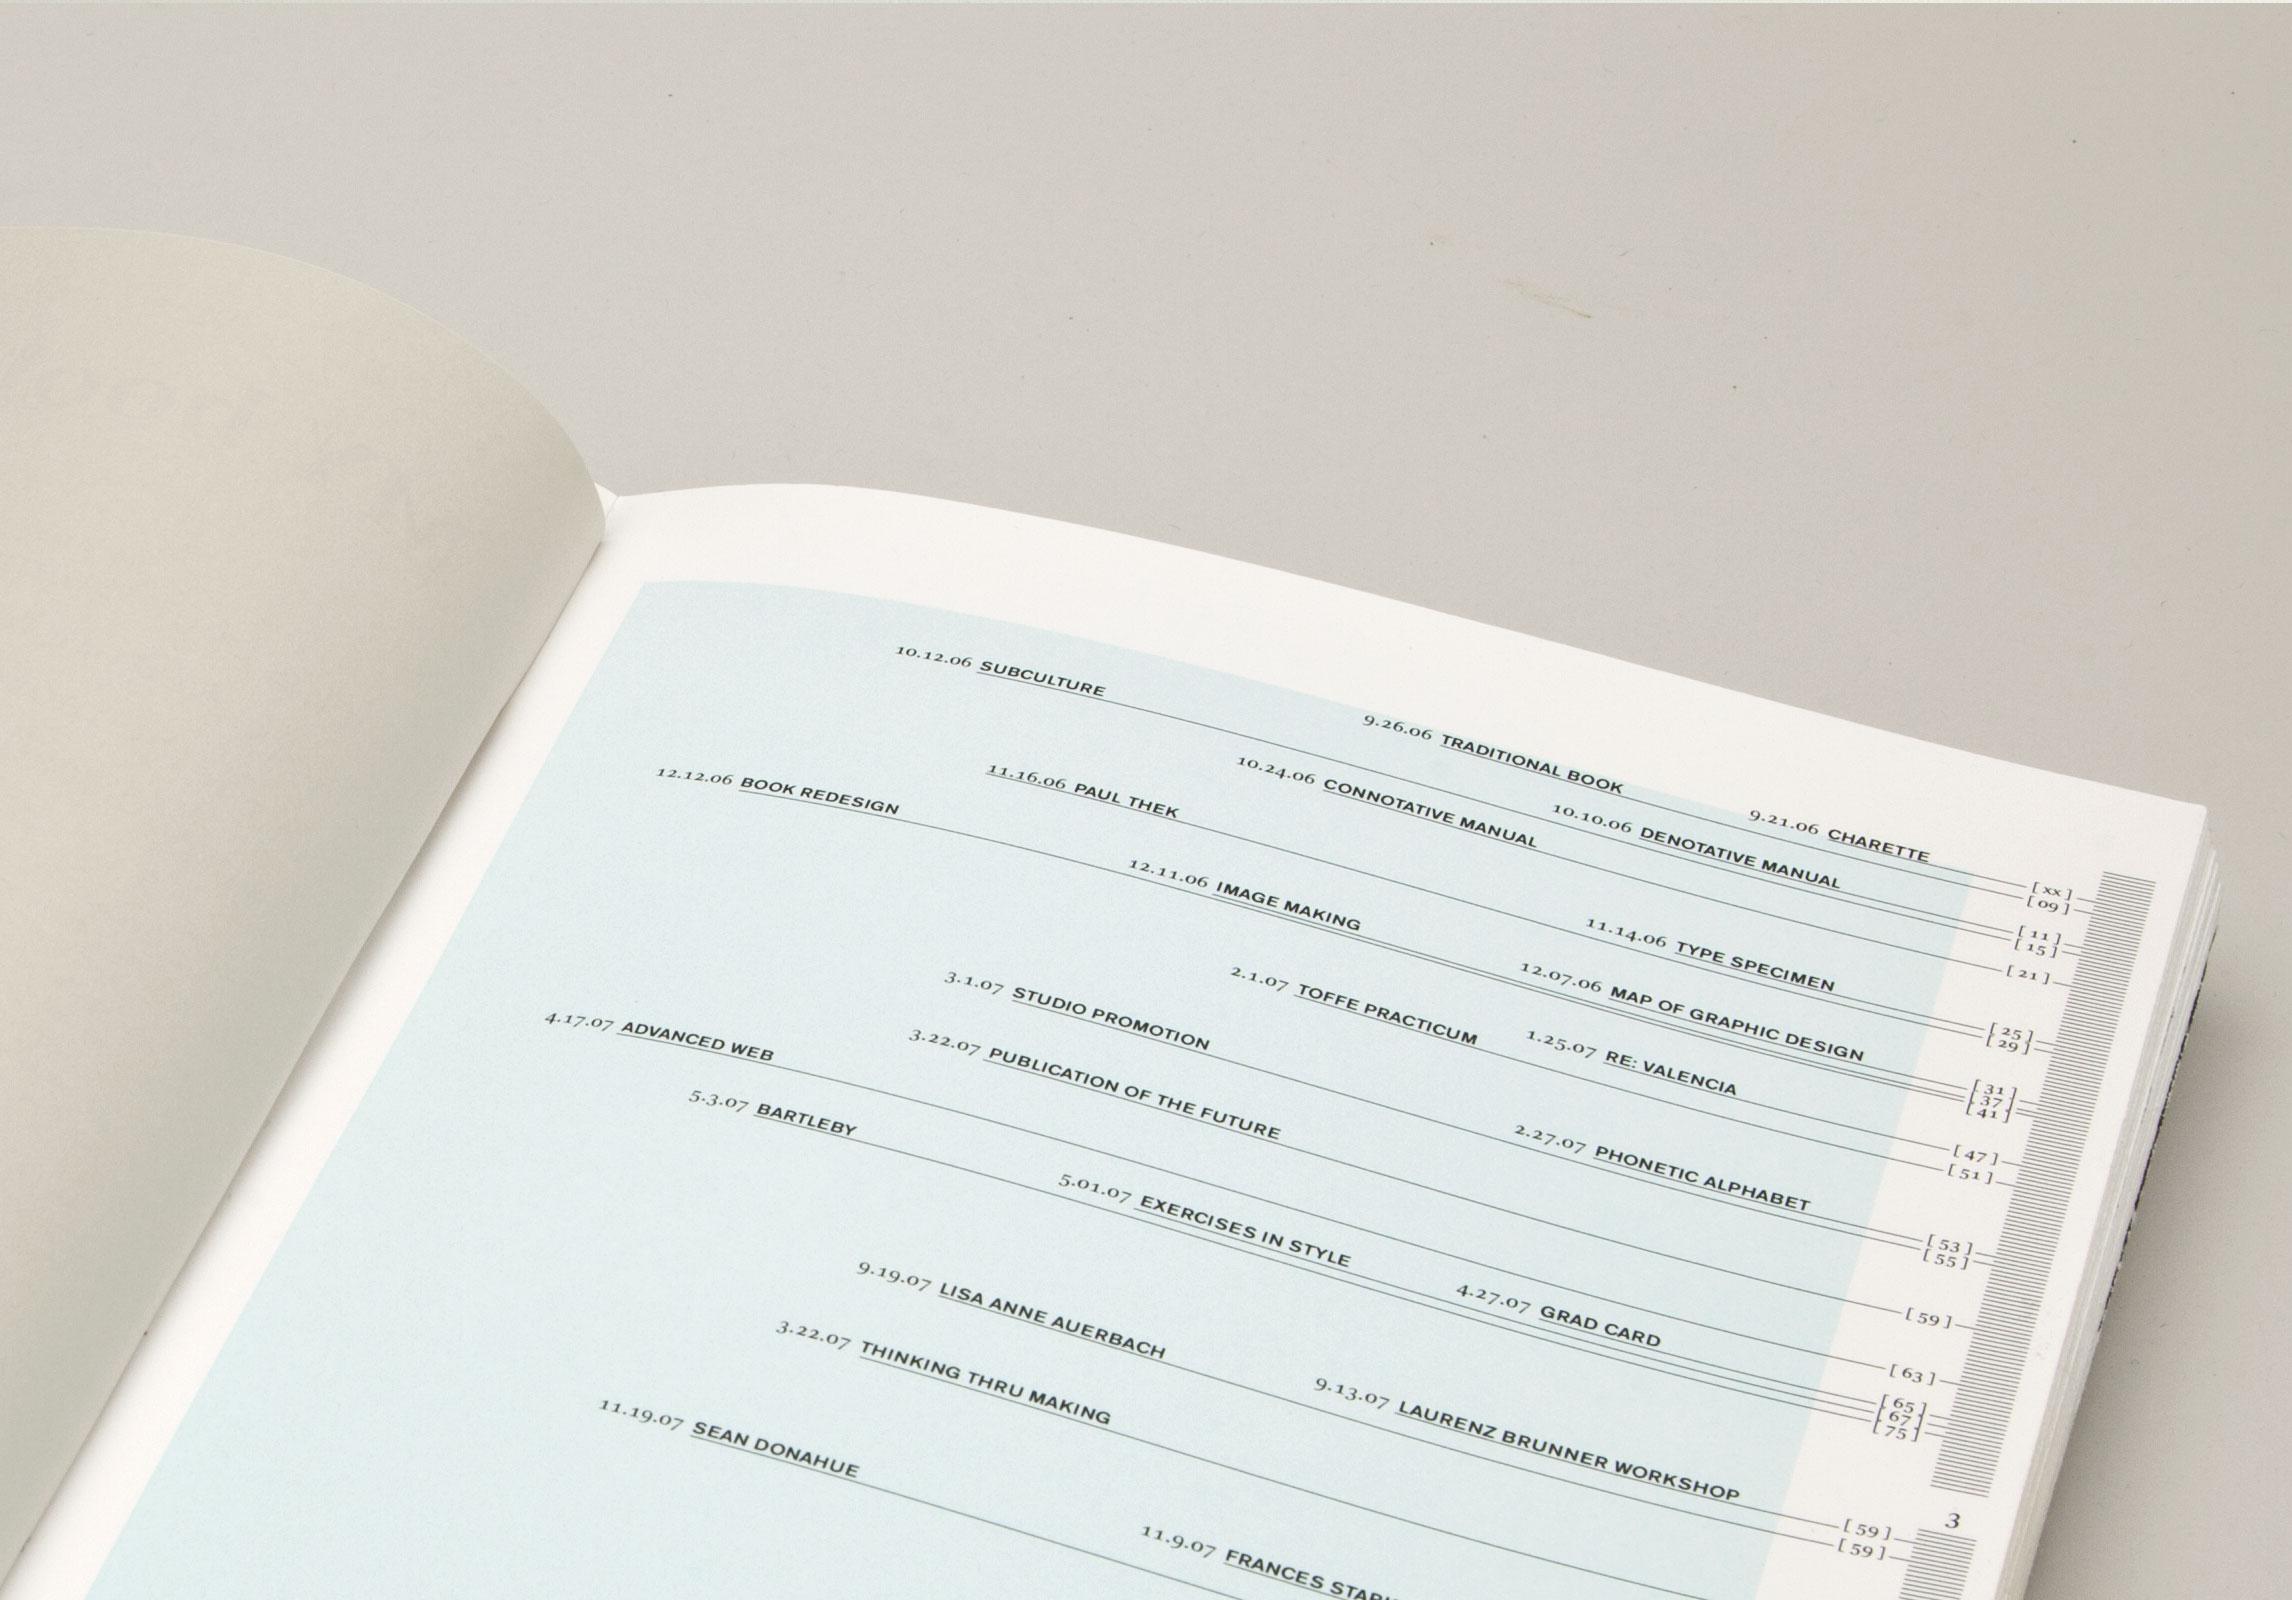 CalArts_book_04.jpg